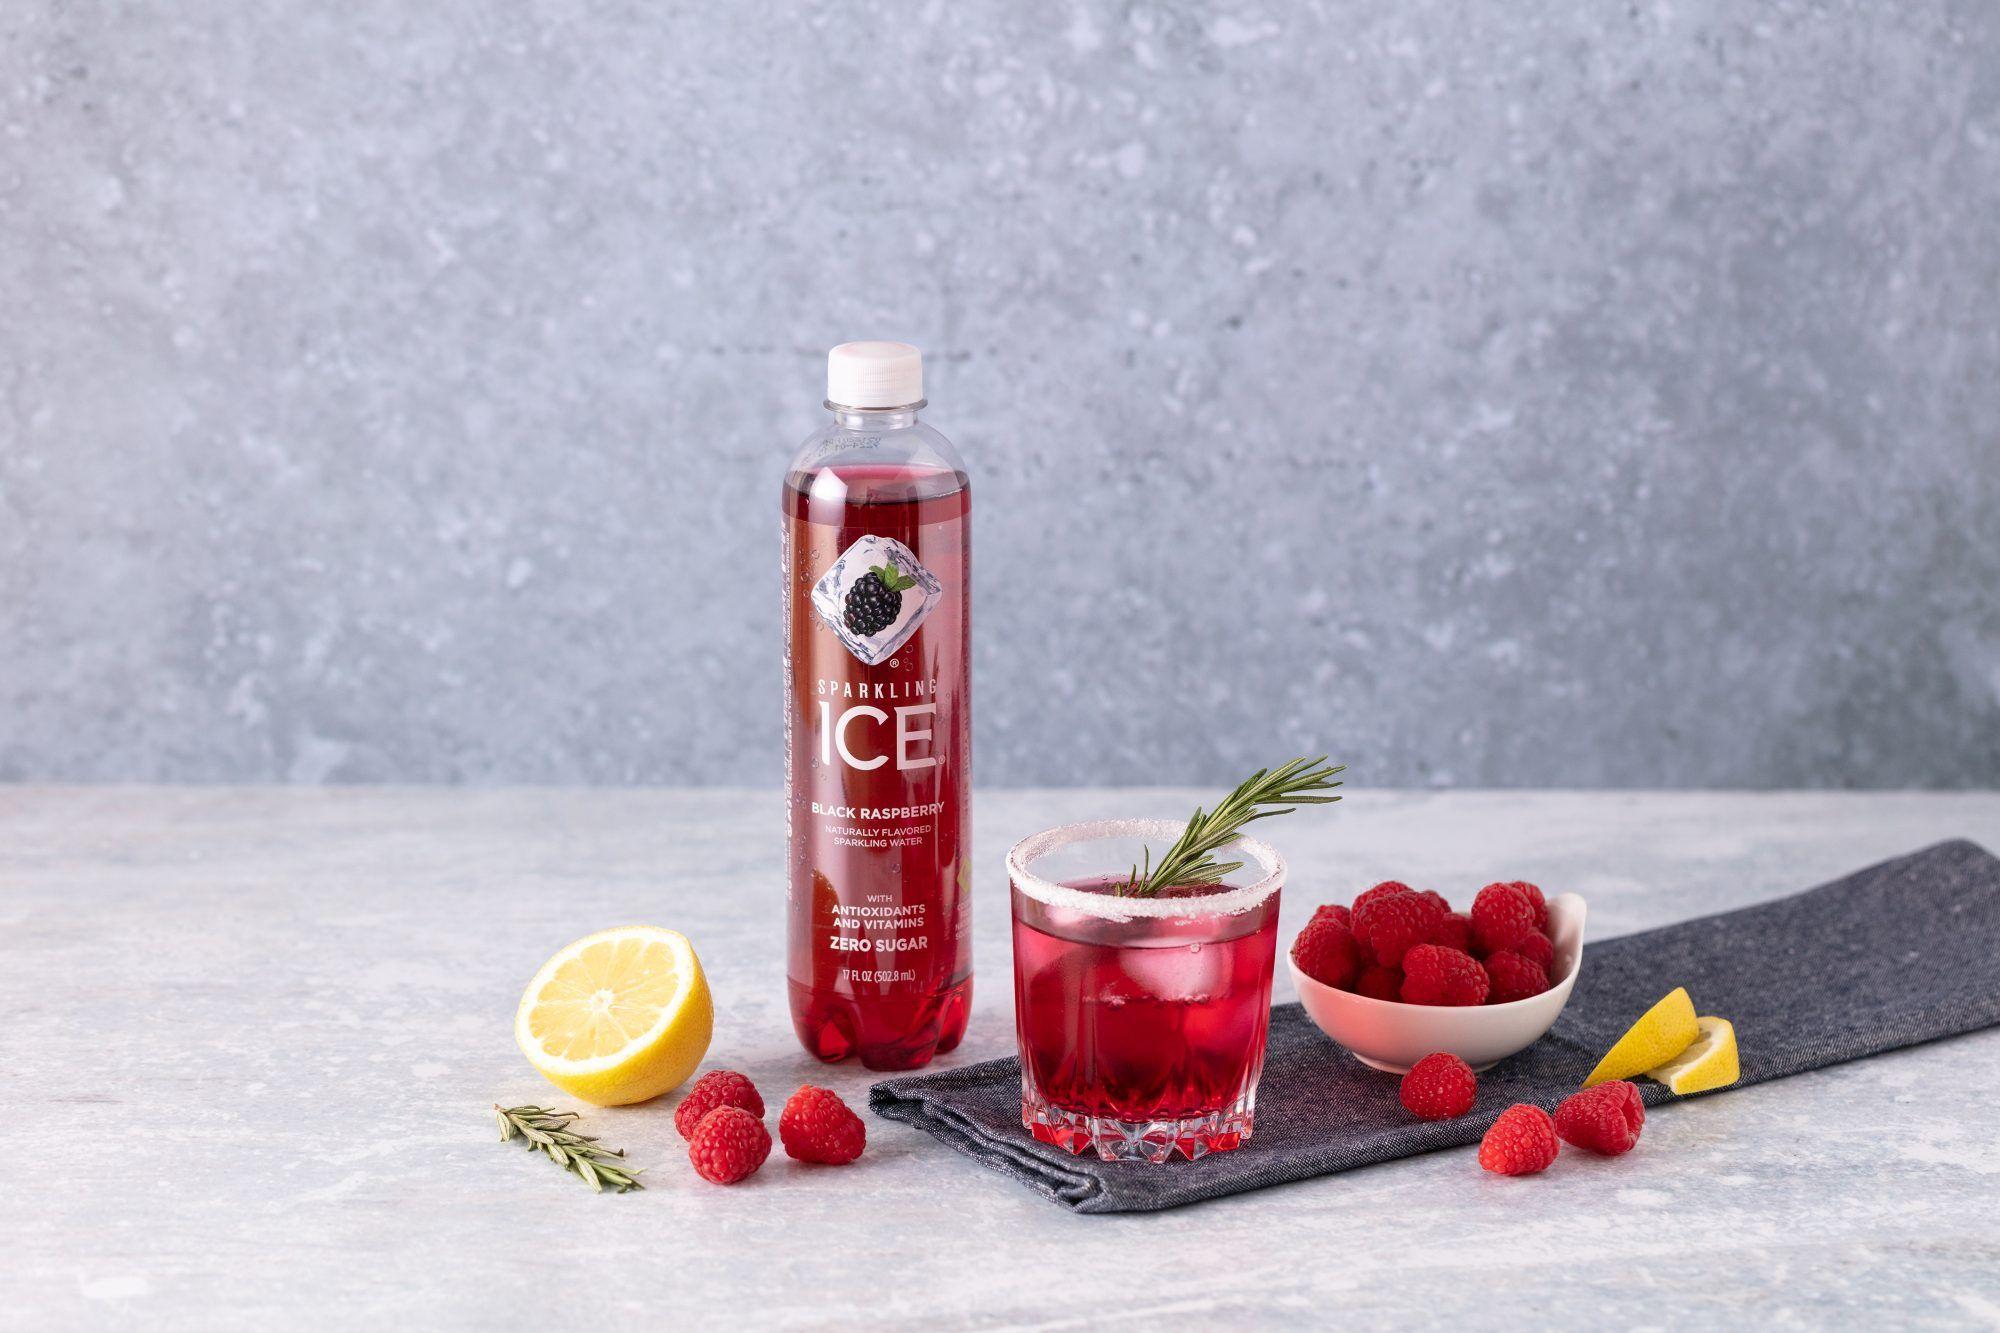 What You Need 4 Oz Sparkling Ice Black Raspberry 2 Oz Vodka 1 Tbsp Sugar 5 Raspberries 1 Lemon Wedge 2 Sprigs Of Rosemary In 2020 Keto Drink Alcoholic Treats Berries